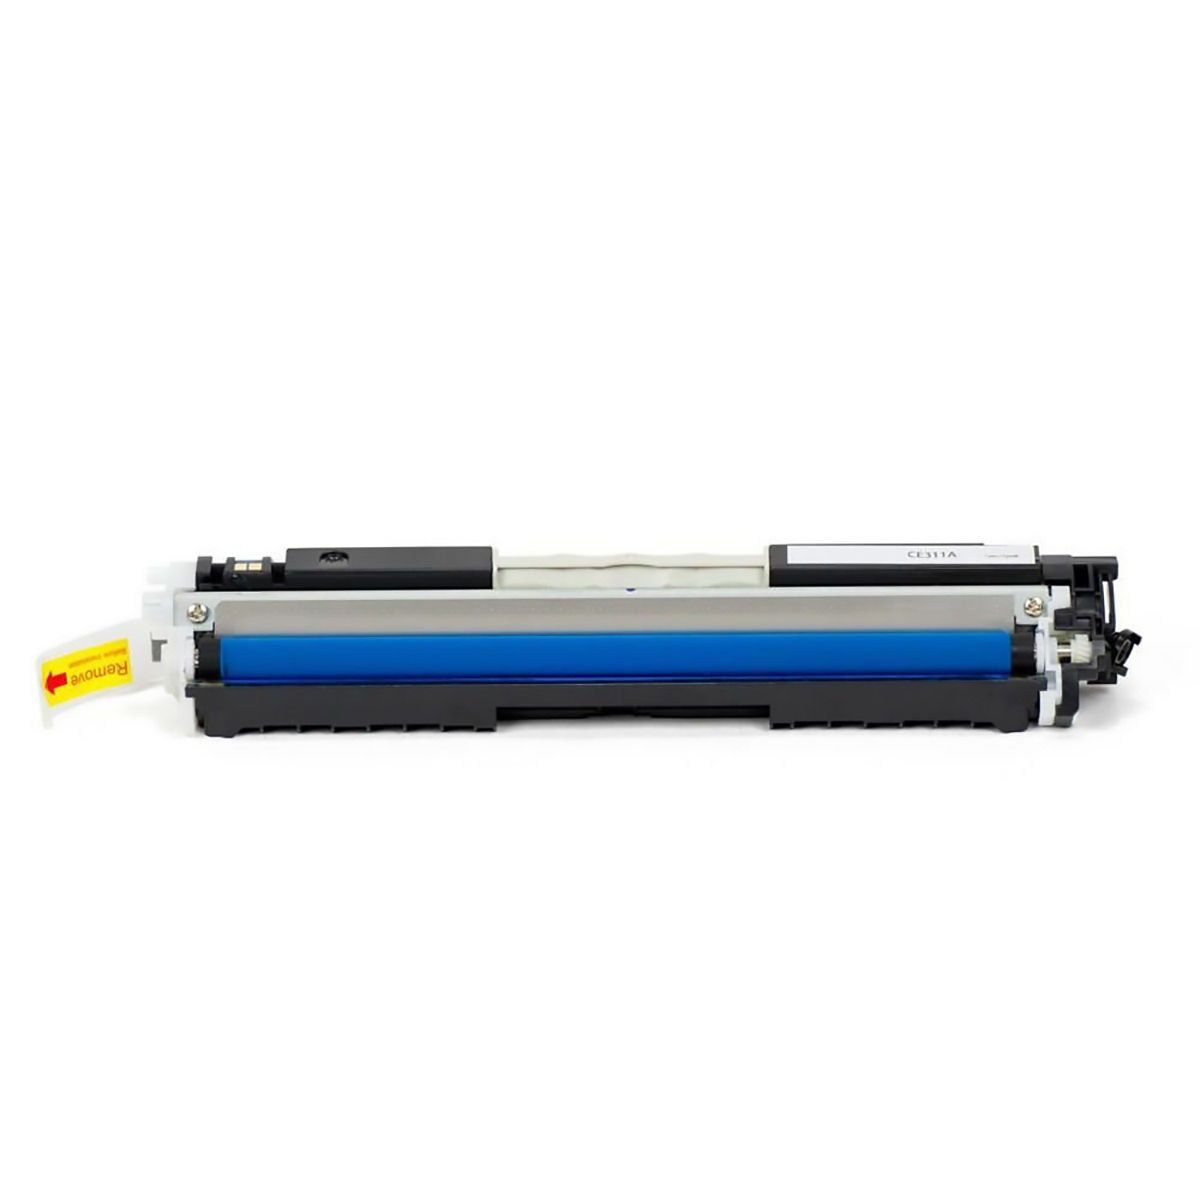 Compatível: Toner CE311A CF351A para HP CP-1020nw CP-1025nw M175a M175nw M177fw M275 M275nw 176n / Ciano / 1.000